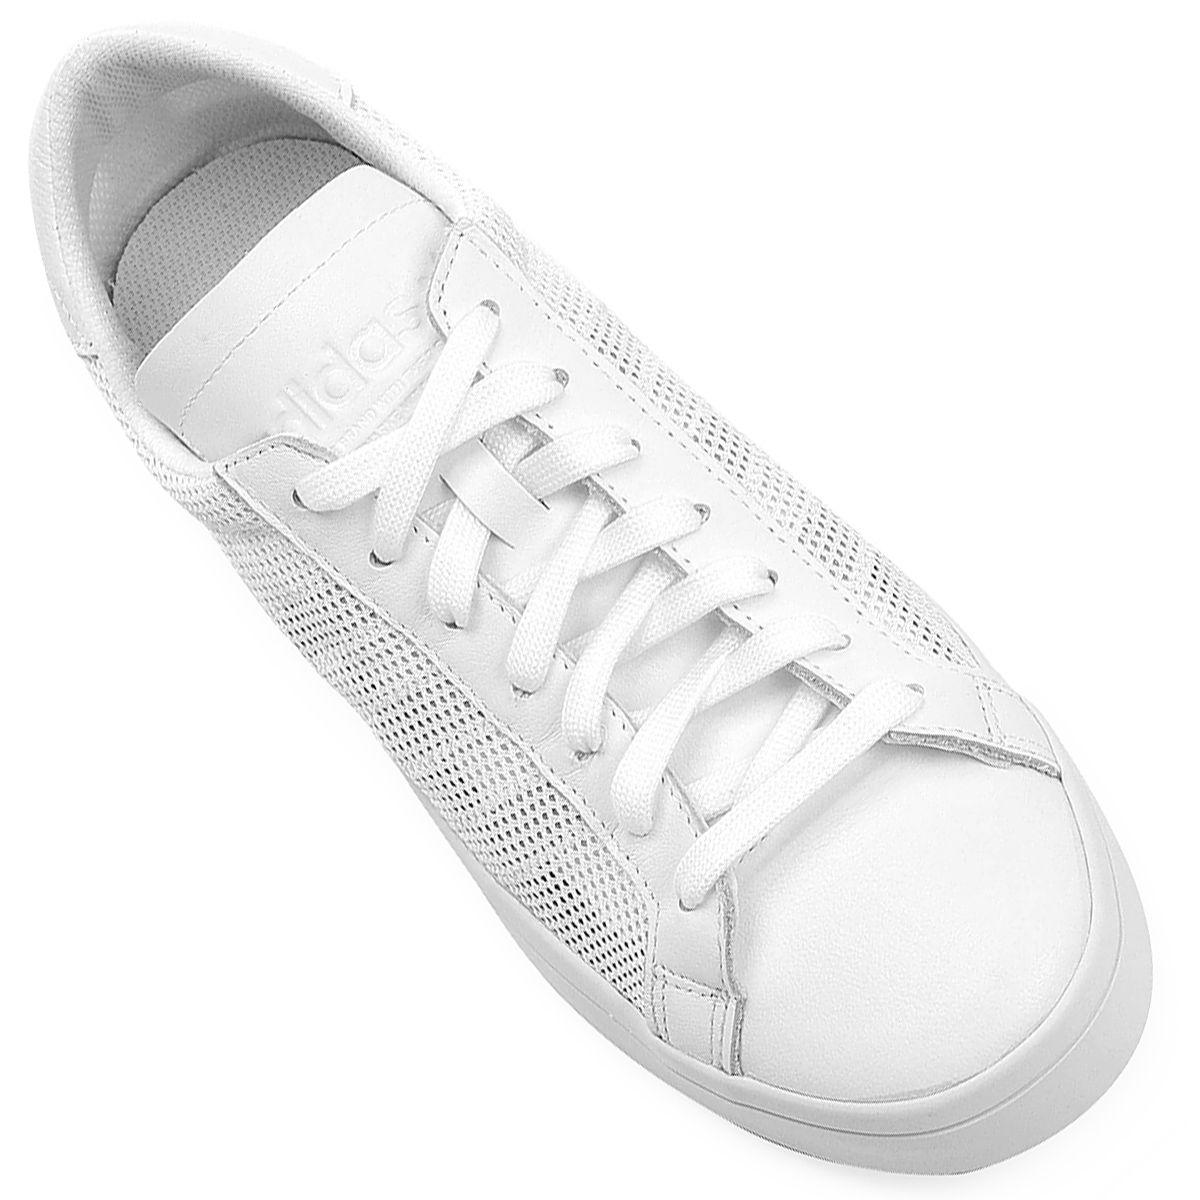 8702515d4d1 Tênis Adidas Courtvantage Branco